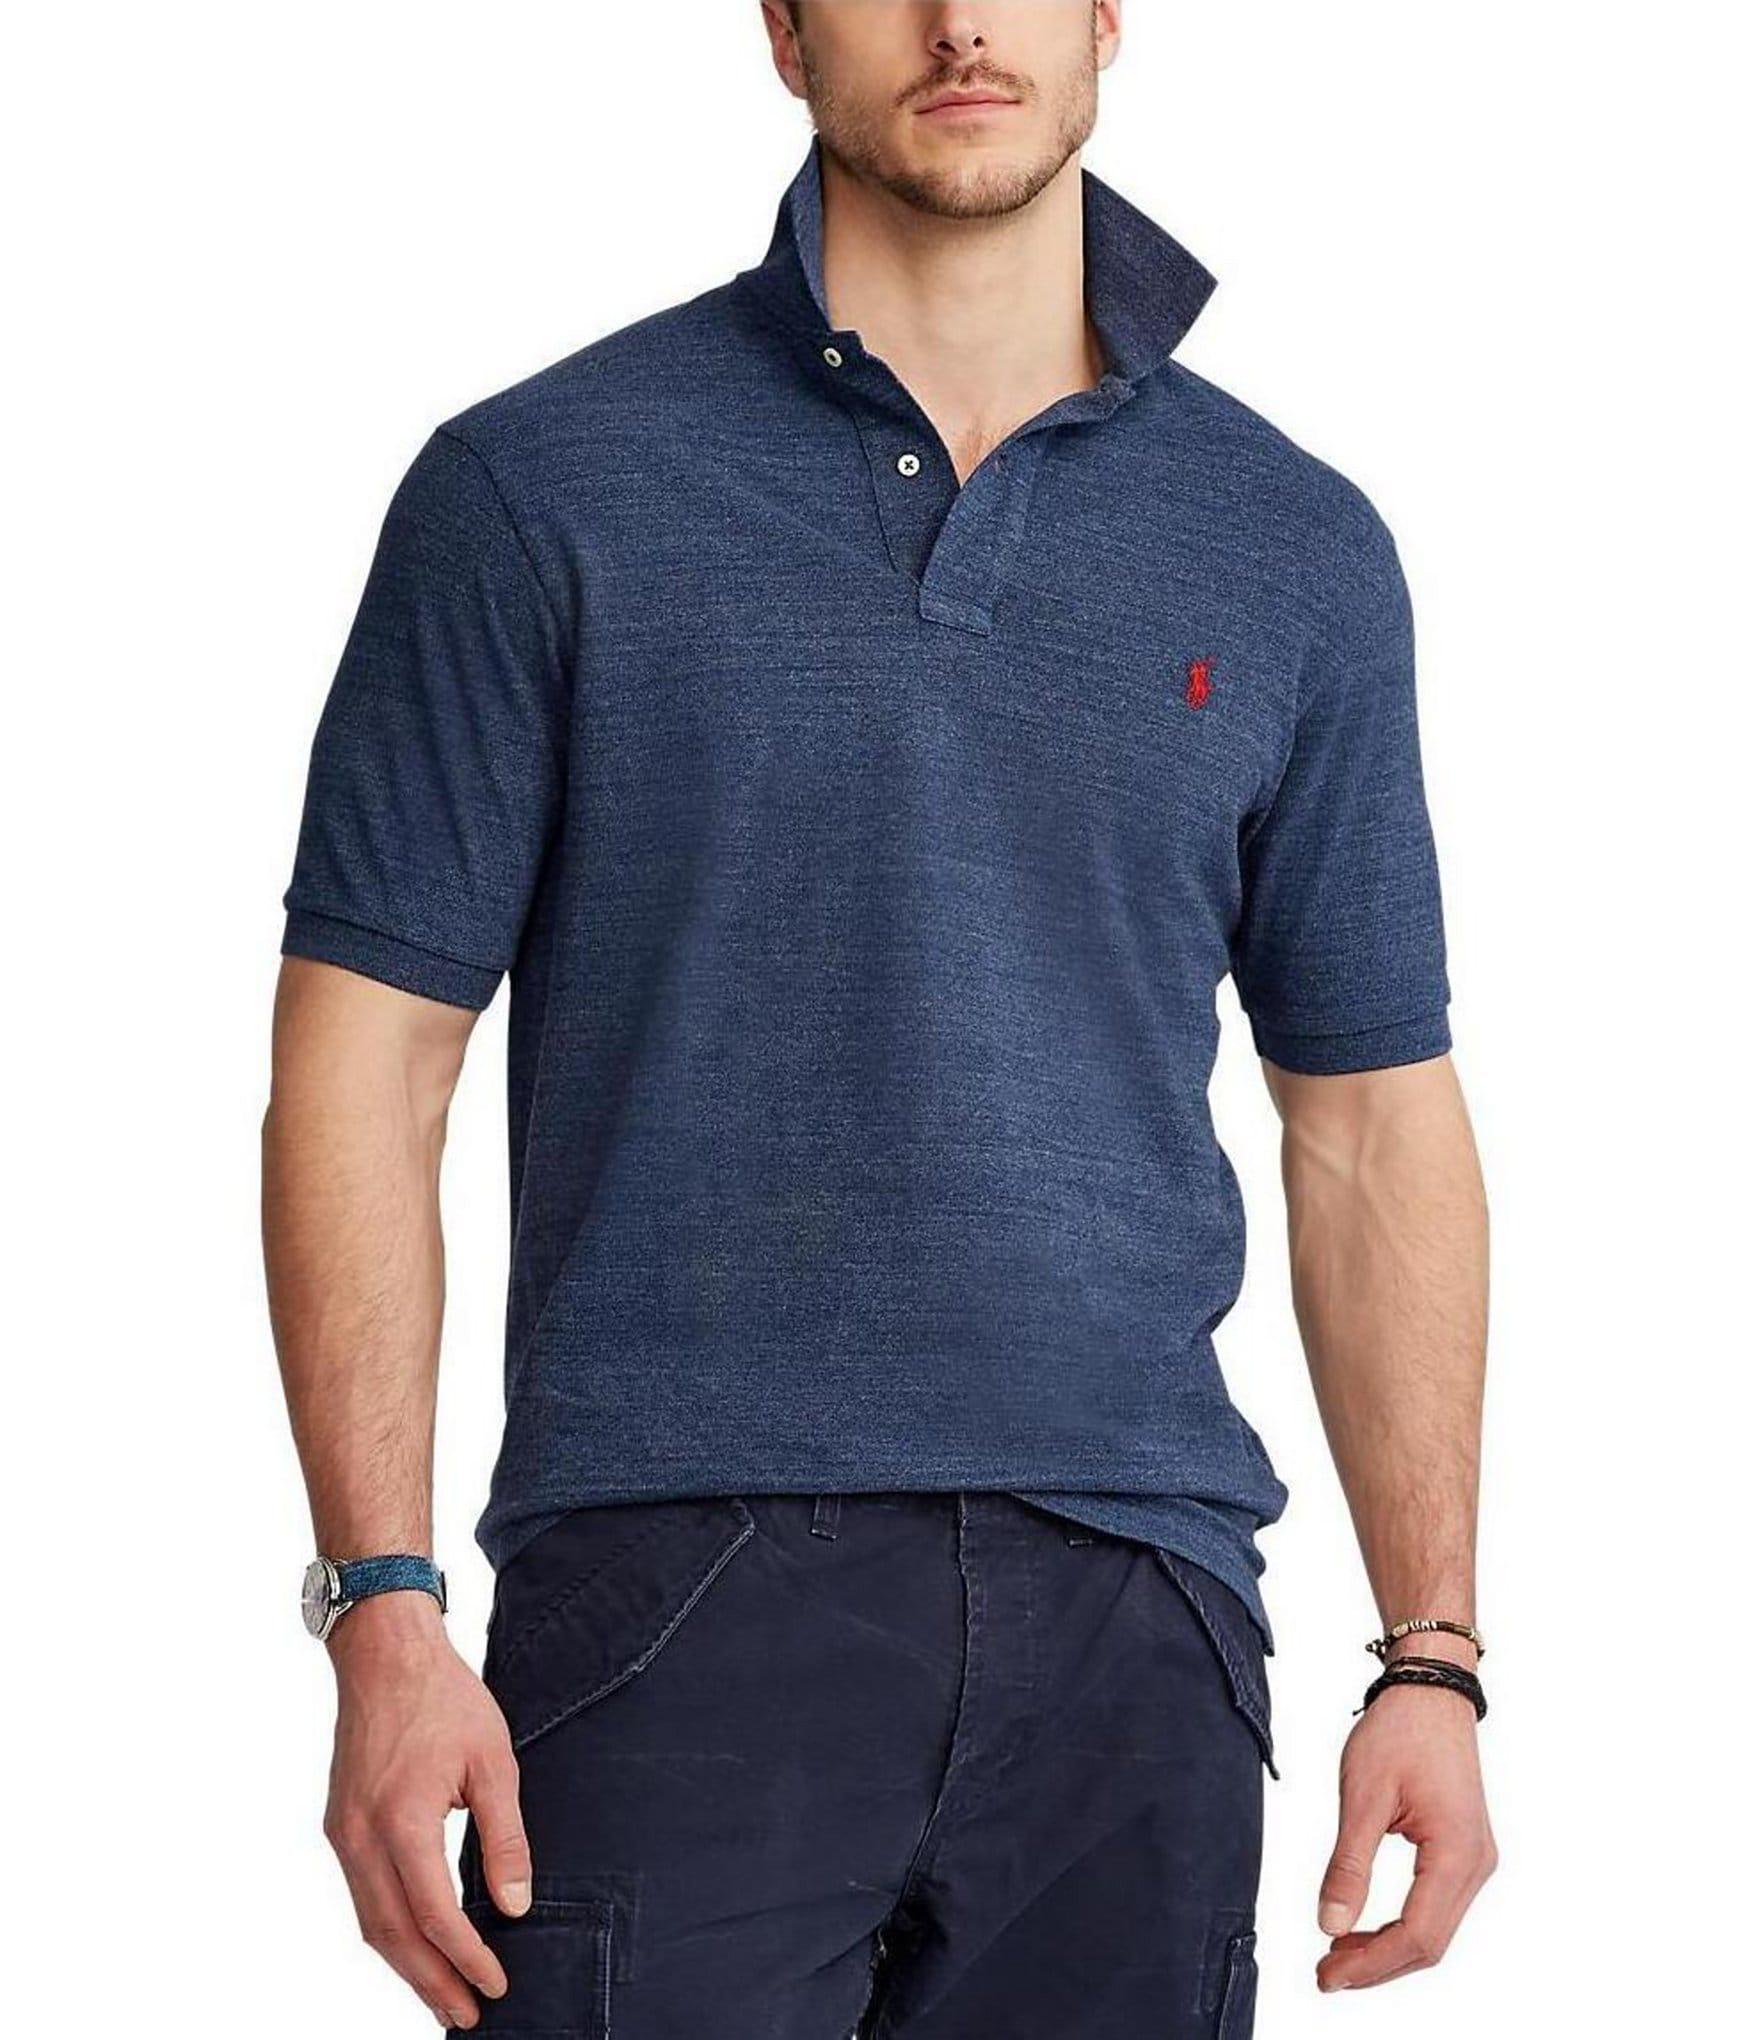 Pas Cher Nice Sortie Grand Escompte Slim-fit Pima Cotton-jersey Polo Shirt - Midnight bluePolo Ralph Lauren Jt0reKj